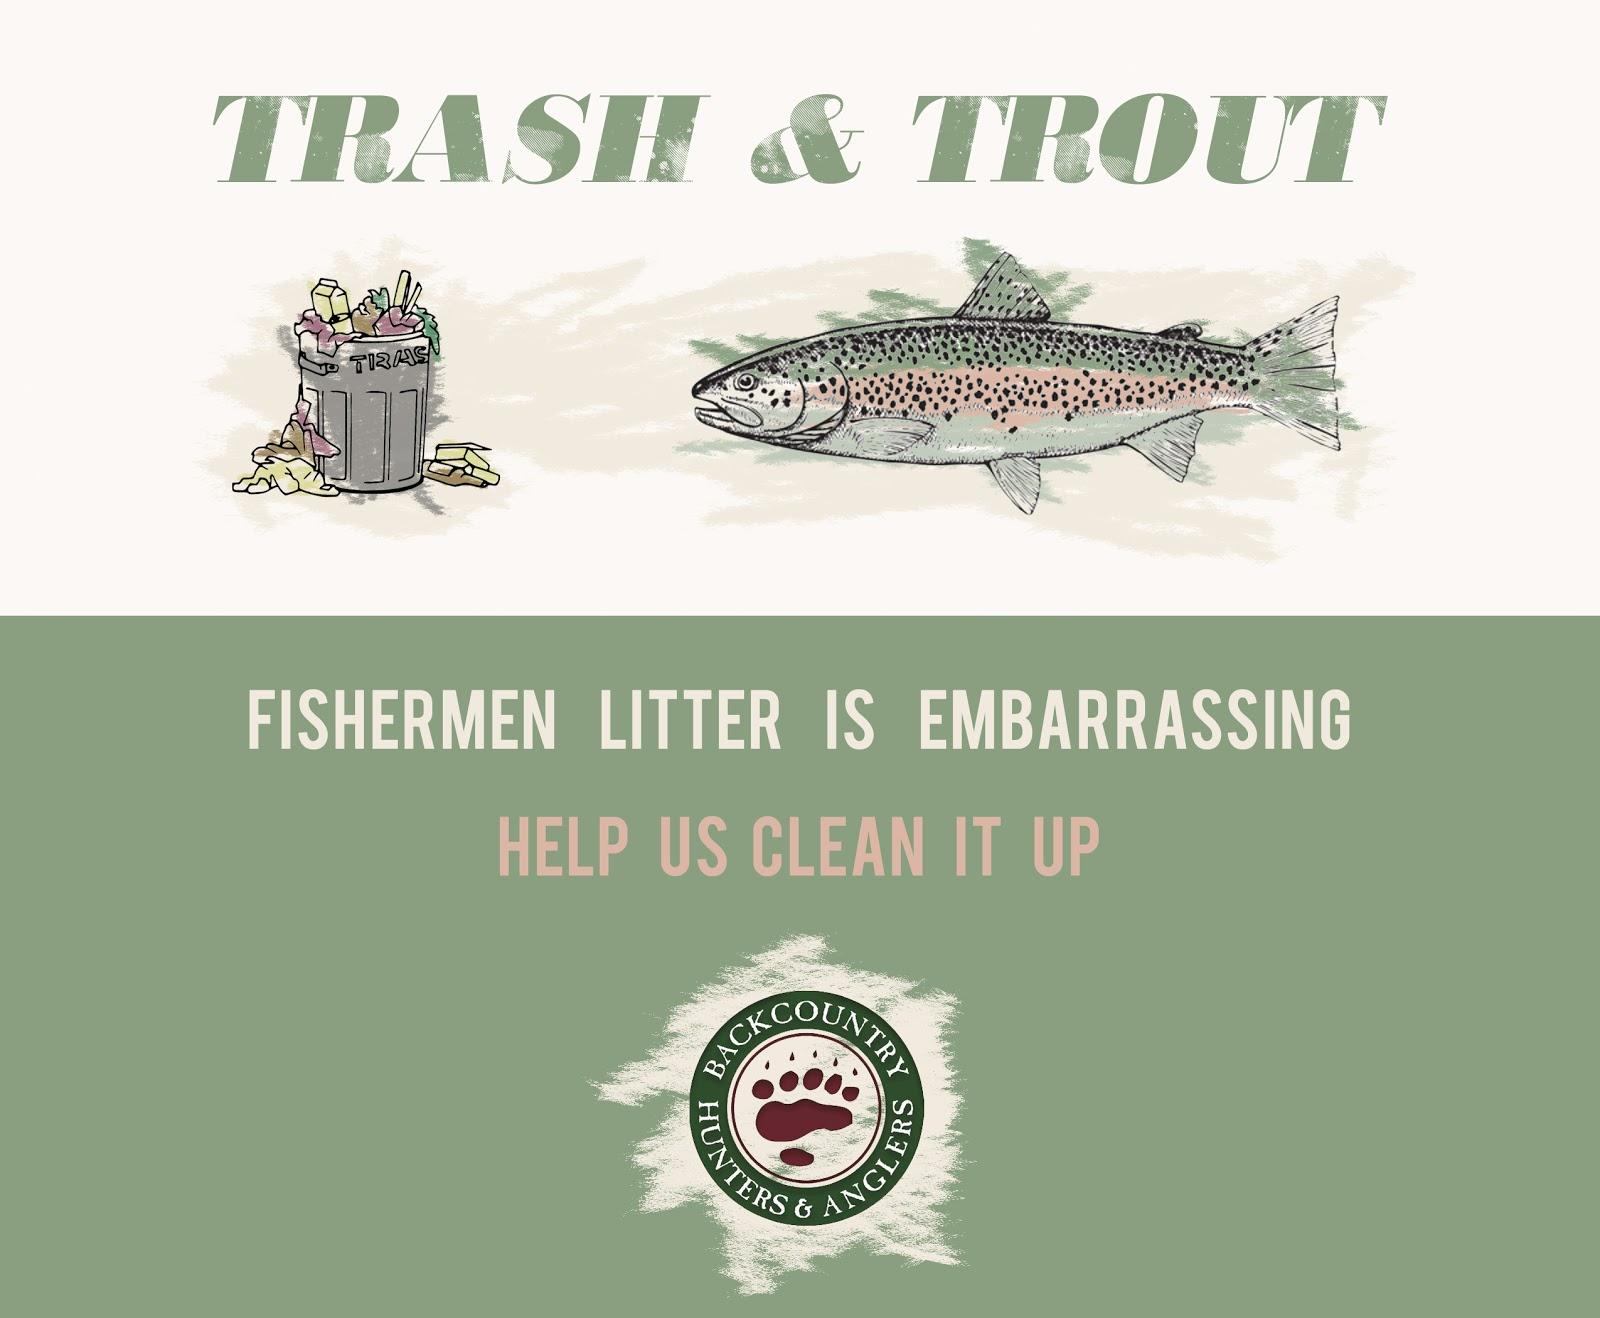 BHA_Trout_Trash_PartnerBanner1.jpg